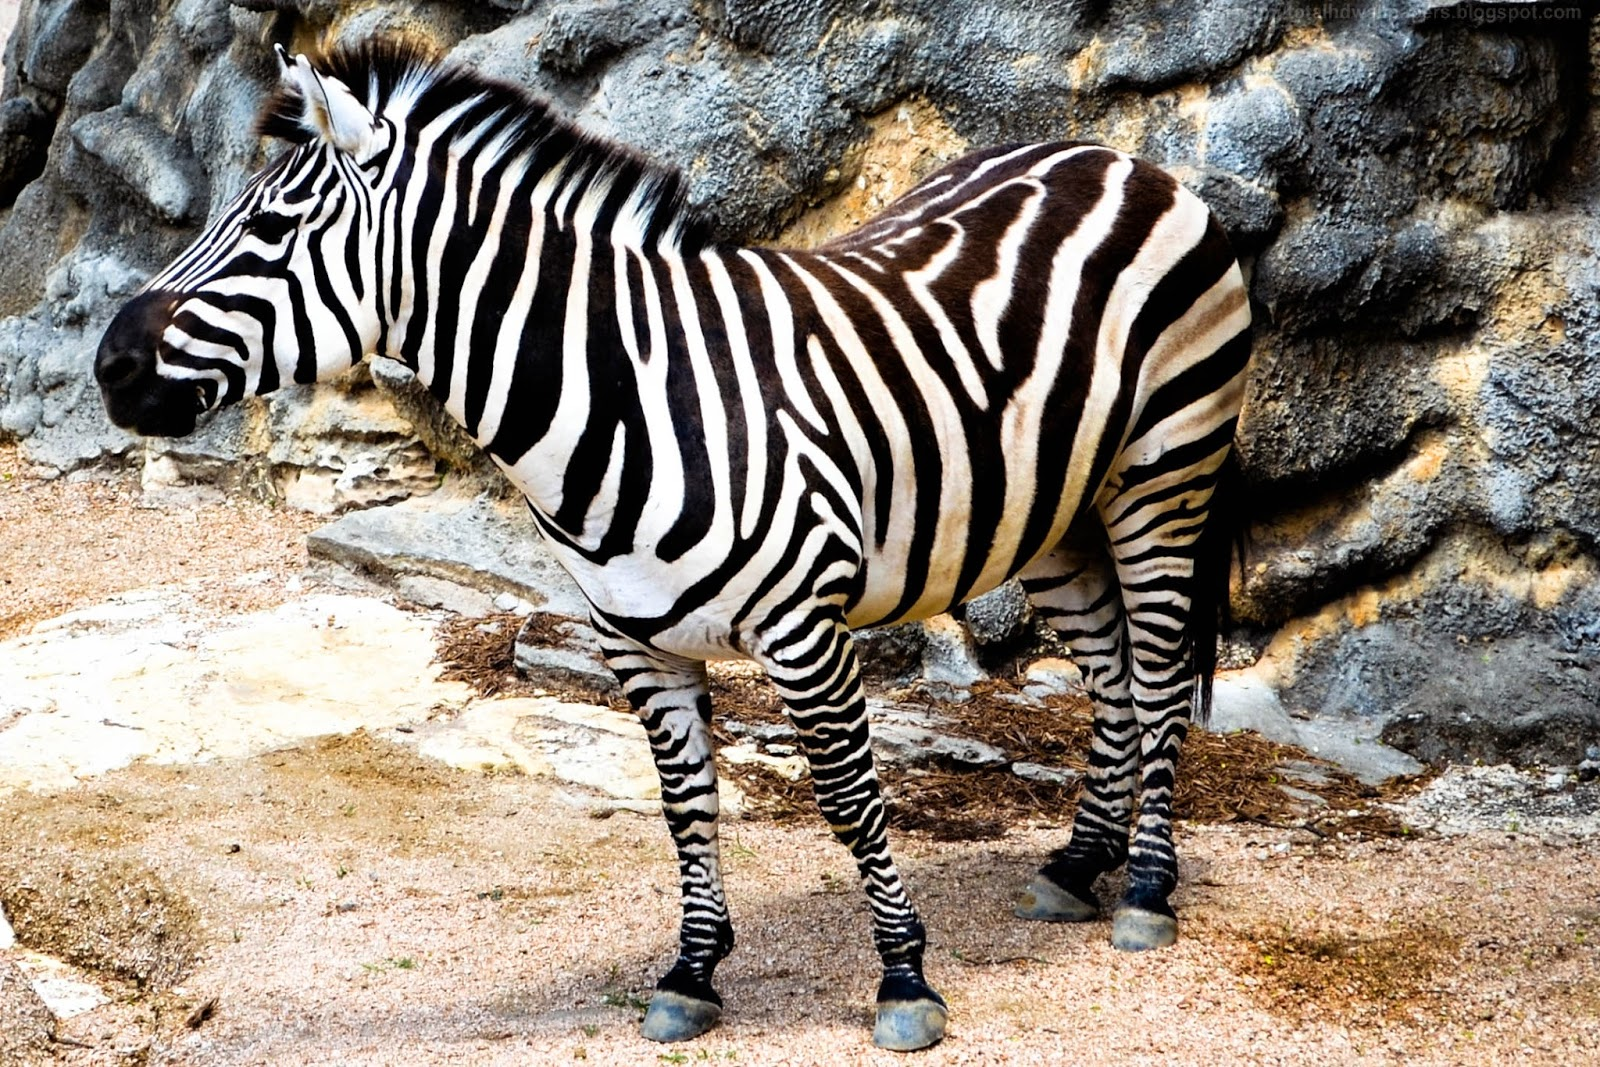 Beautiful desktop hd wallpapers 1080p zebra hd wallpapers for Zebra wallpaper